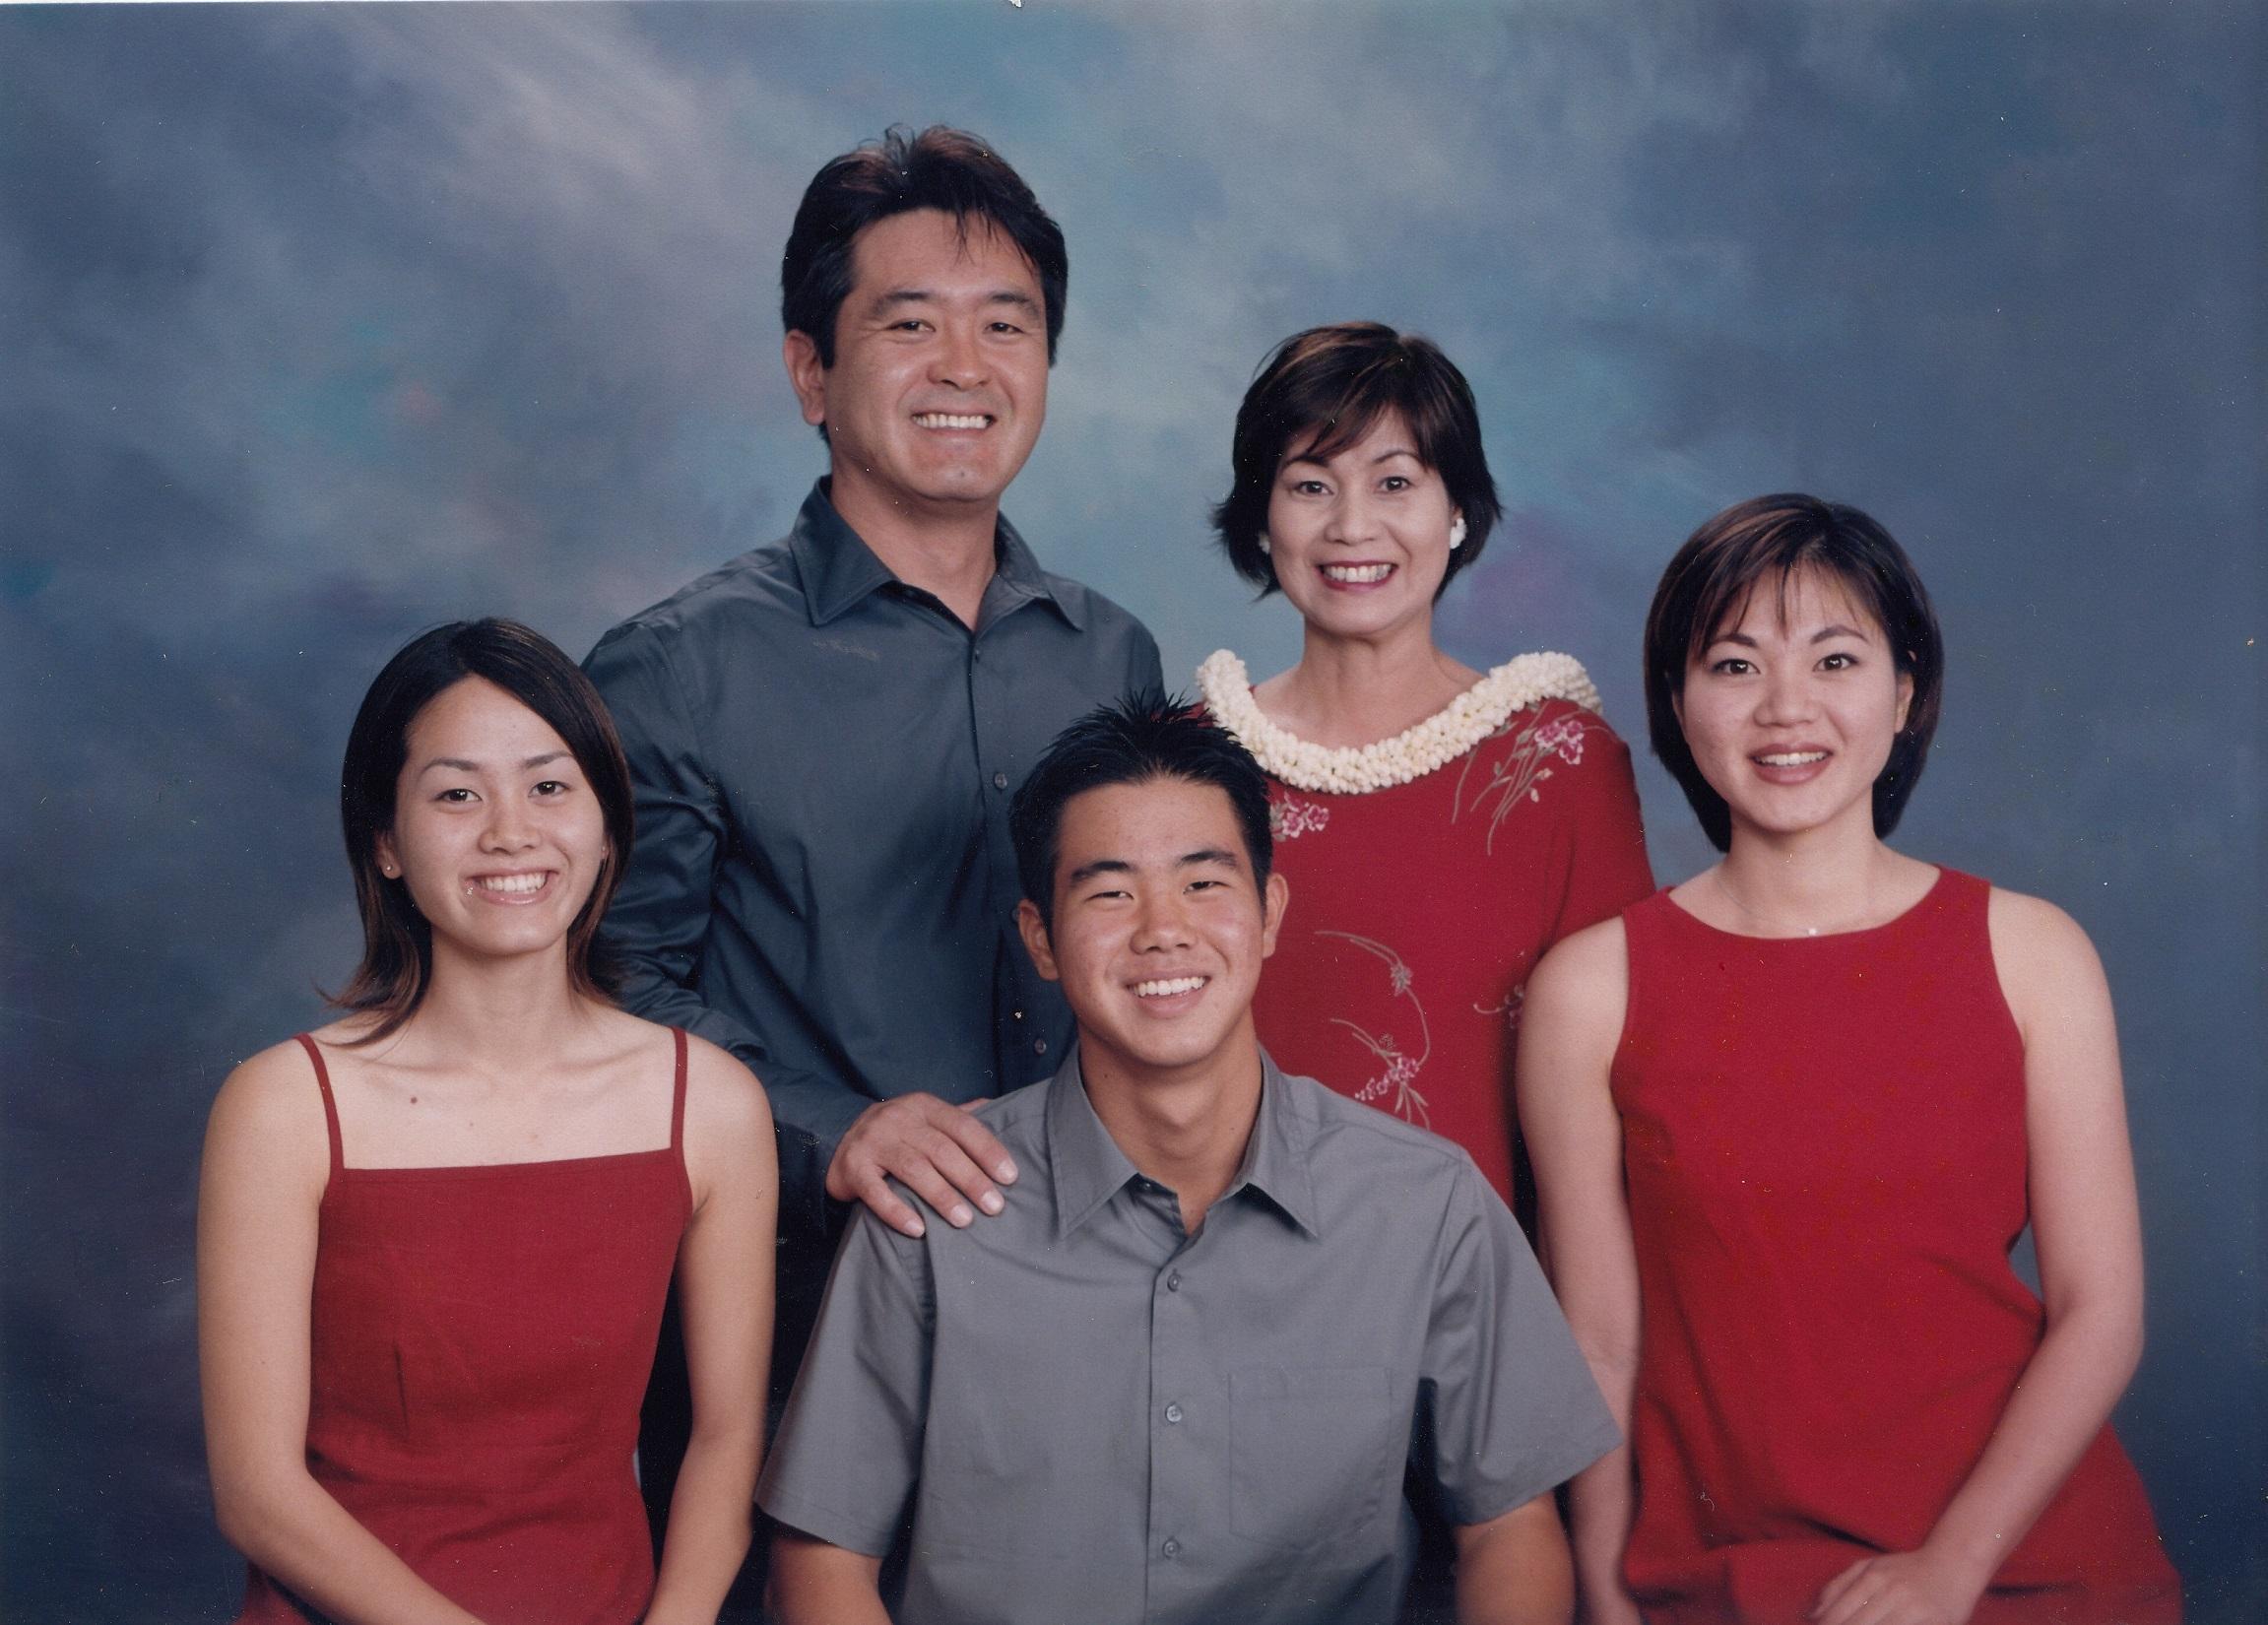 Family photo of Hidehito and Keiko Uki and their children (from left) Hisae, Kenshiro and Jamie.